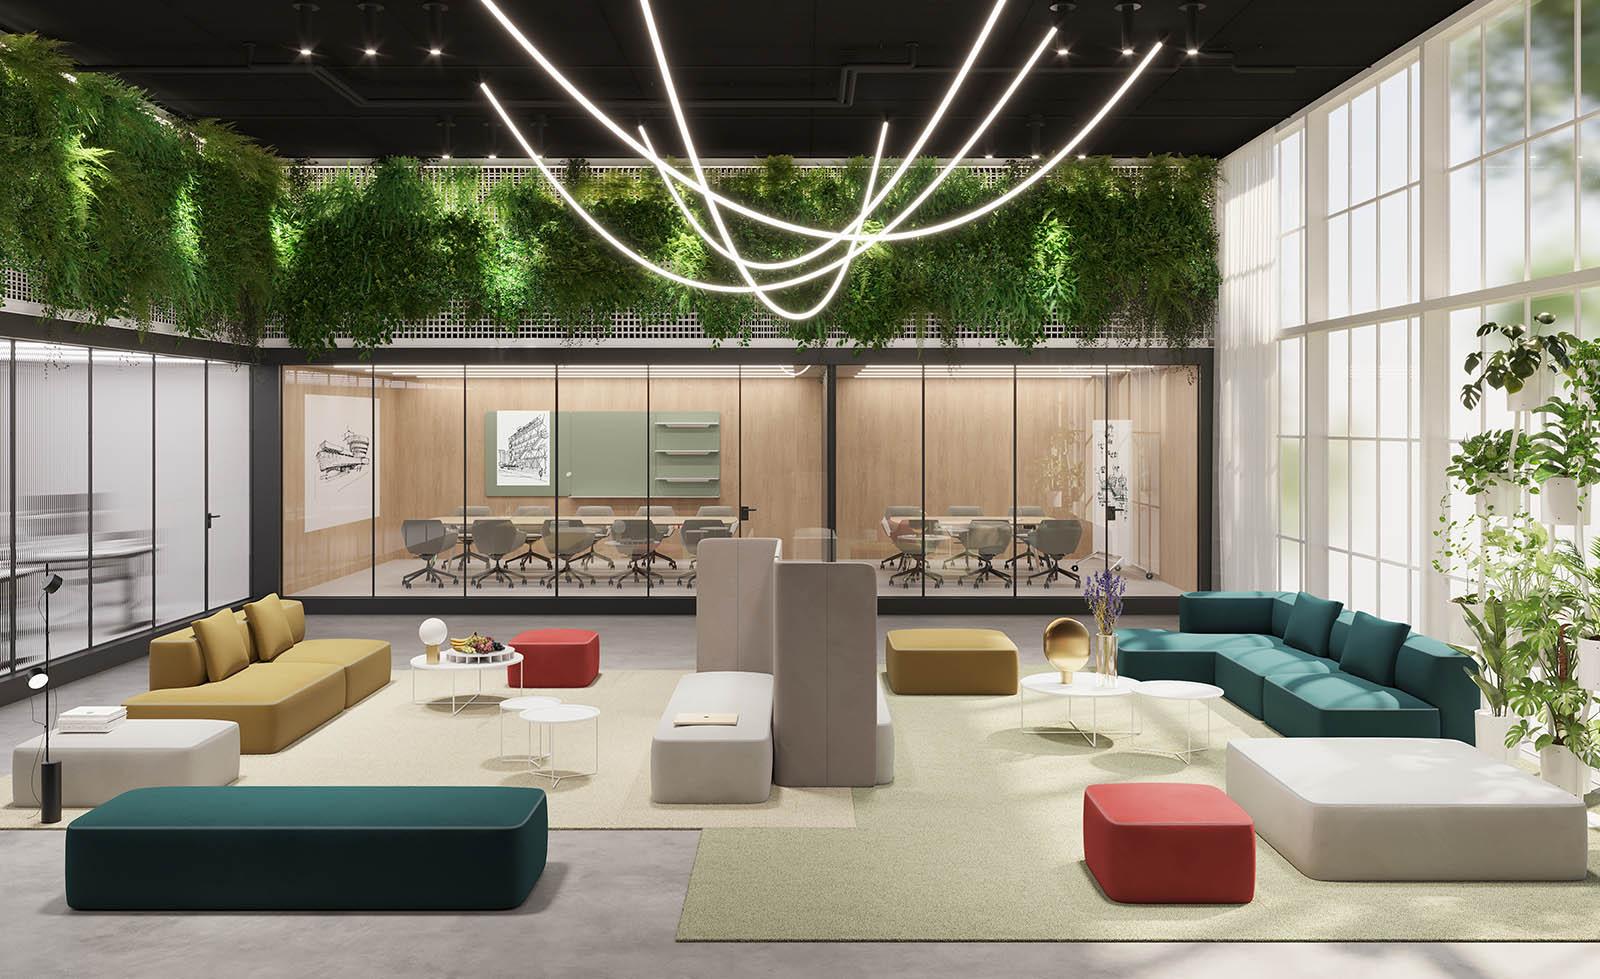 ThThink Furniture - Hybrid Office Design - Brunner Pads Seating Collection